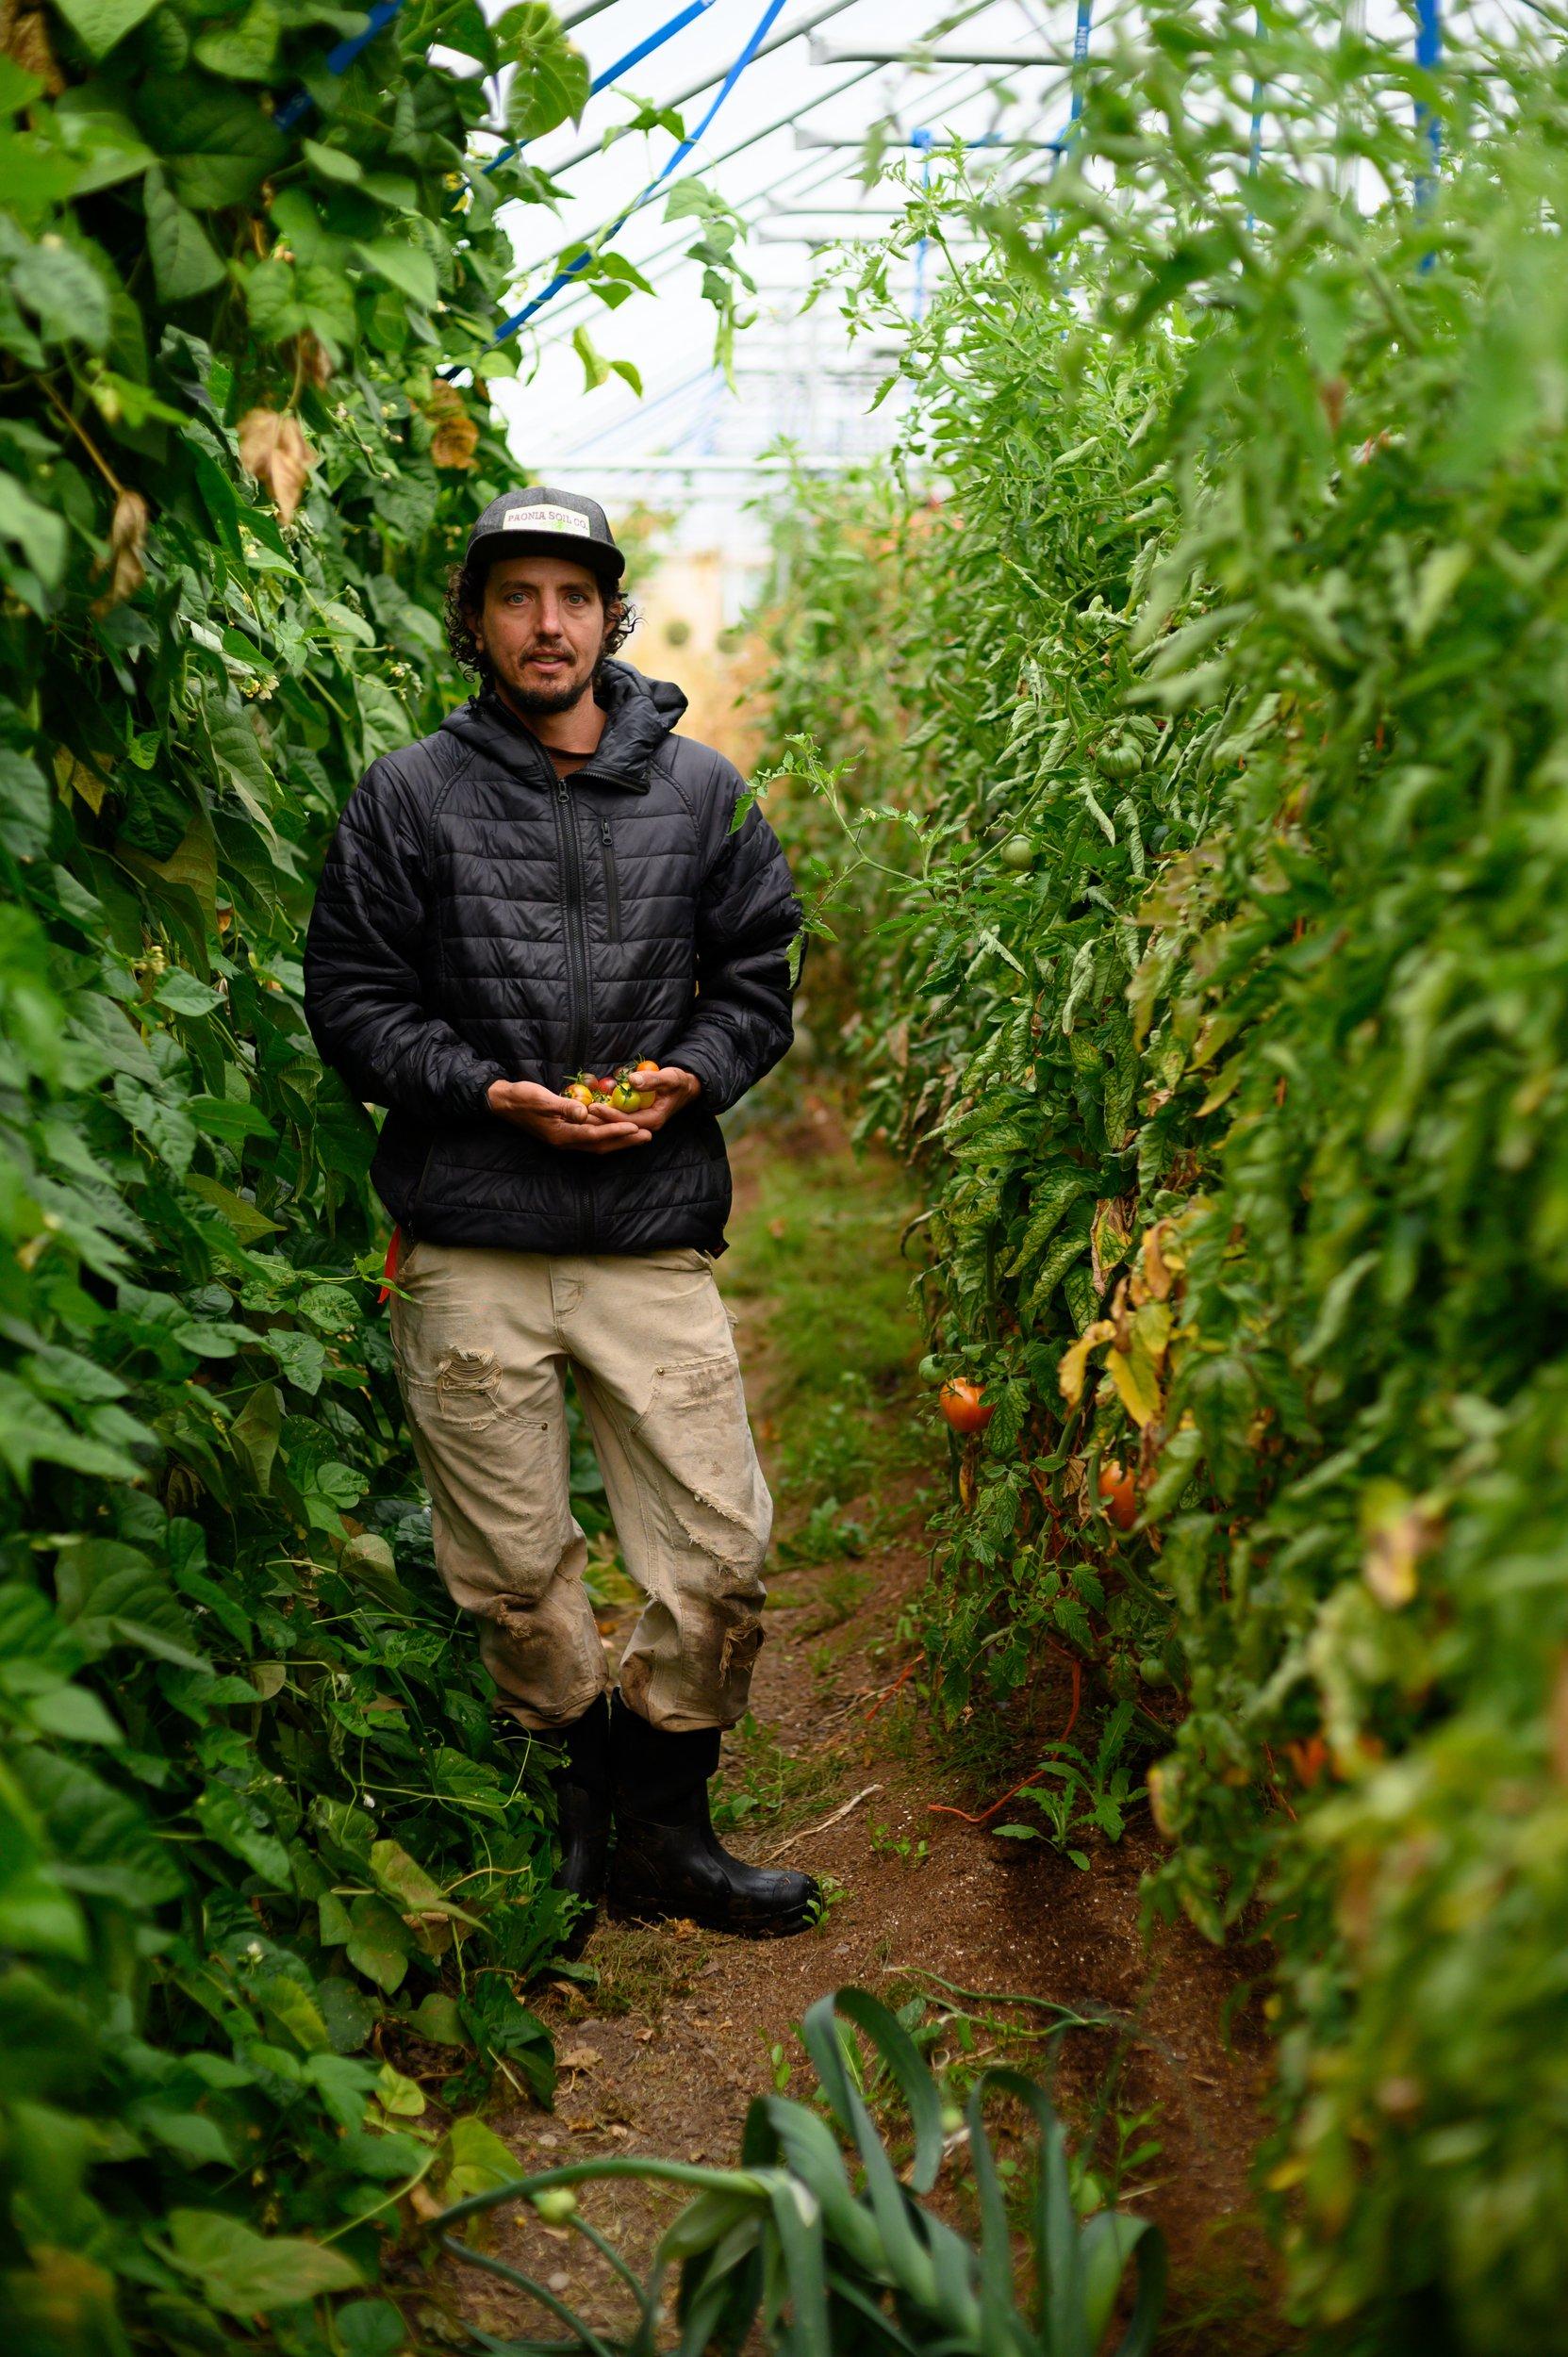 Local farm aspires to global impact thumbnail